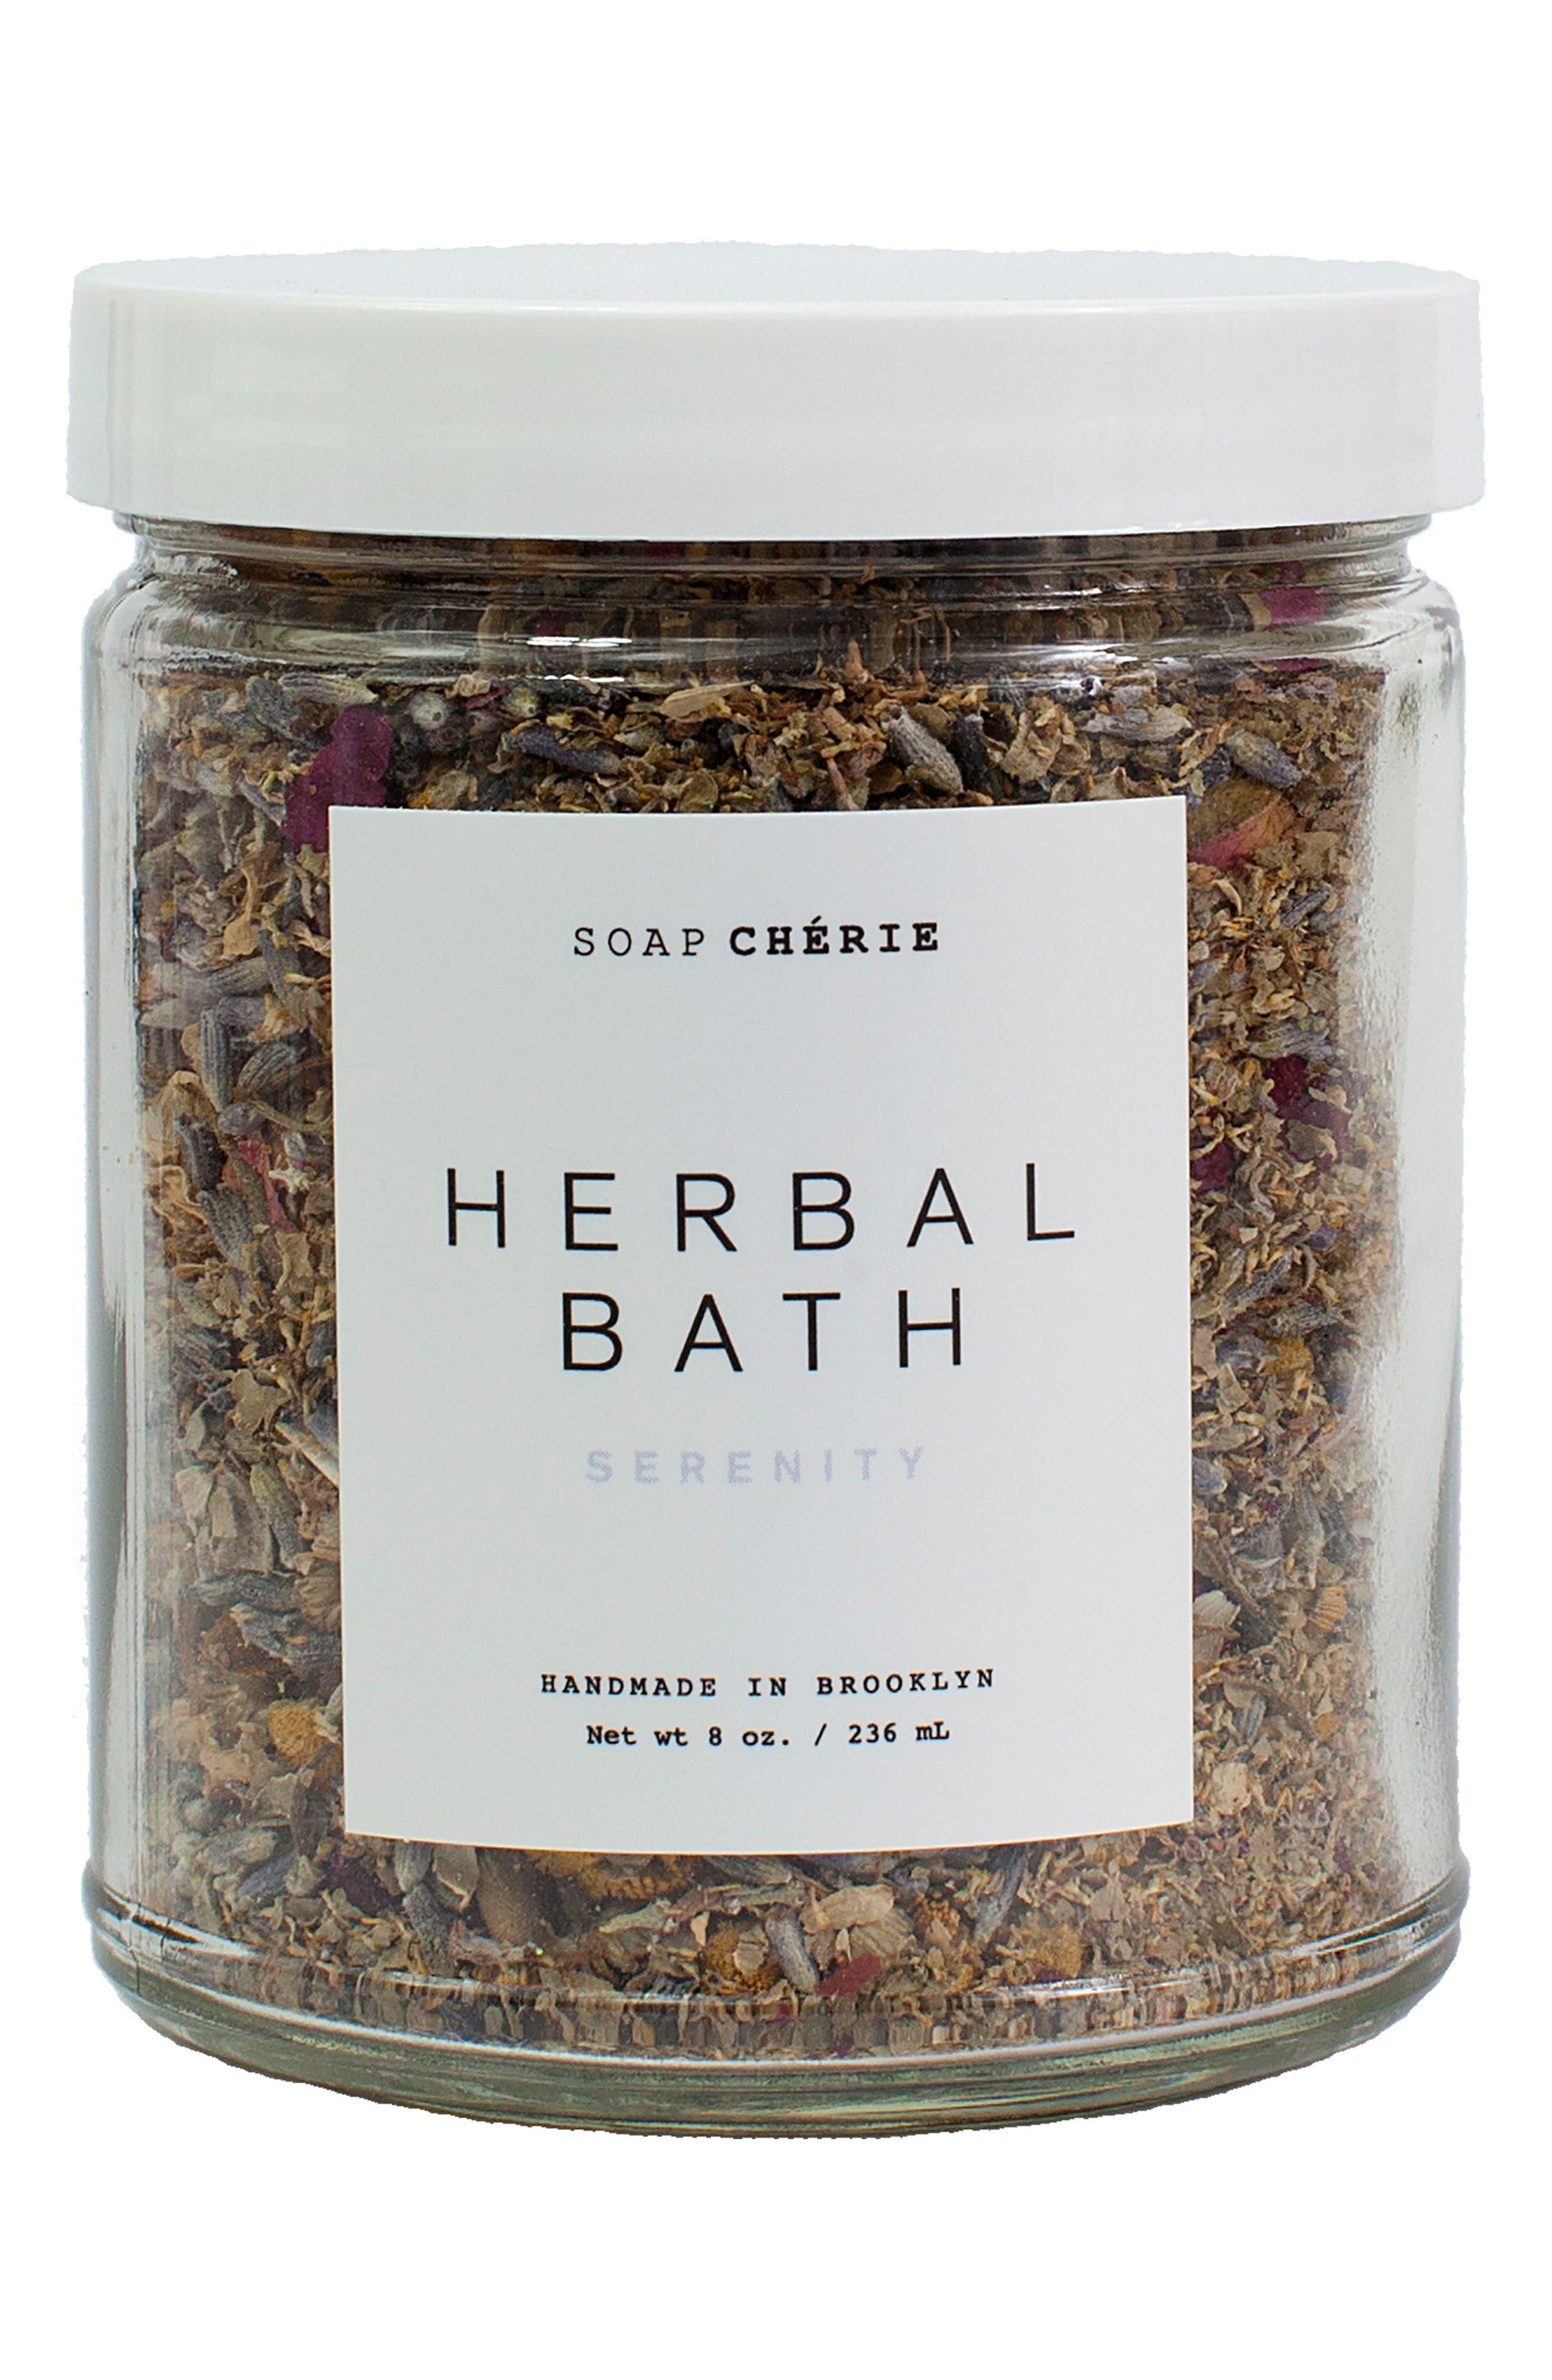 Soap Chérie Serenity Herbal Bath